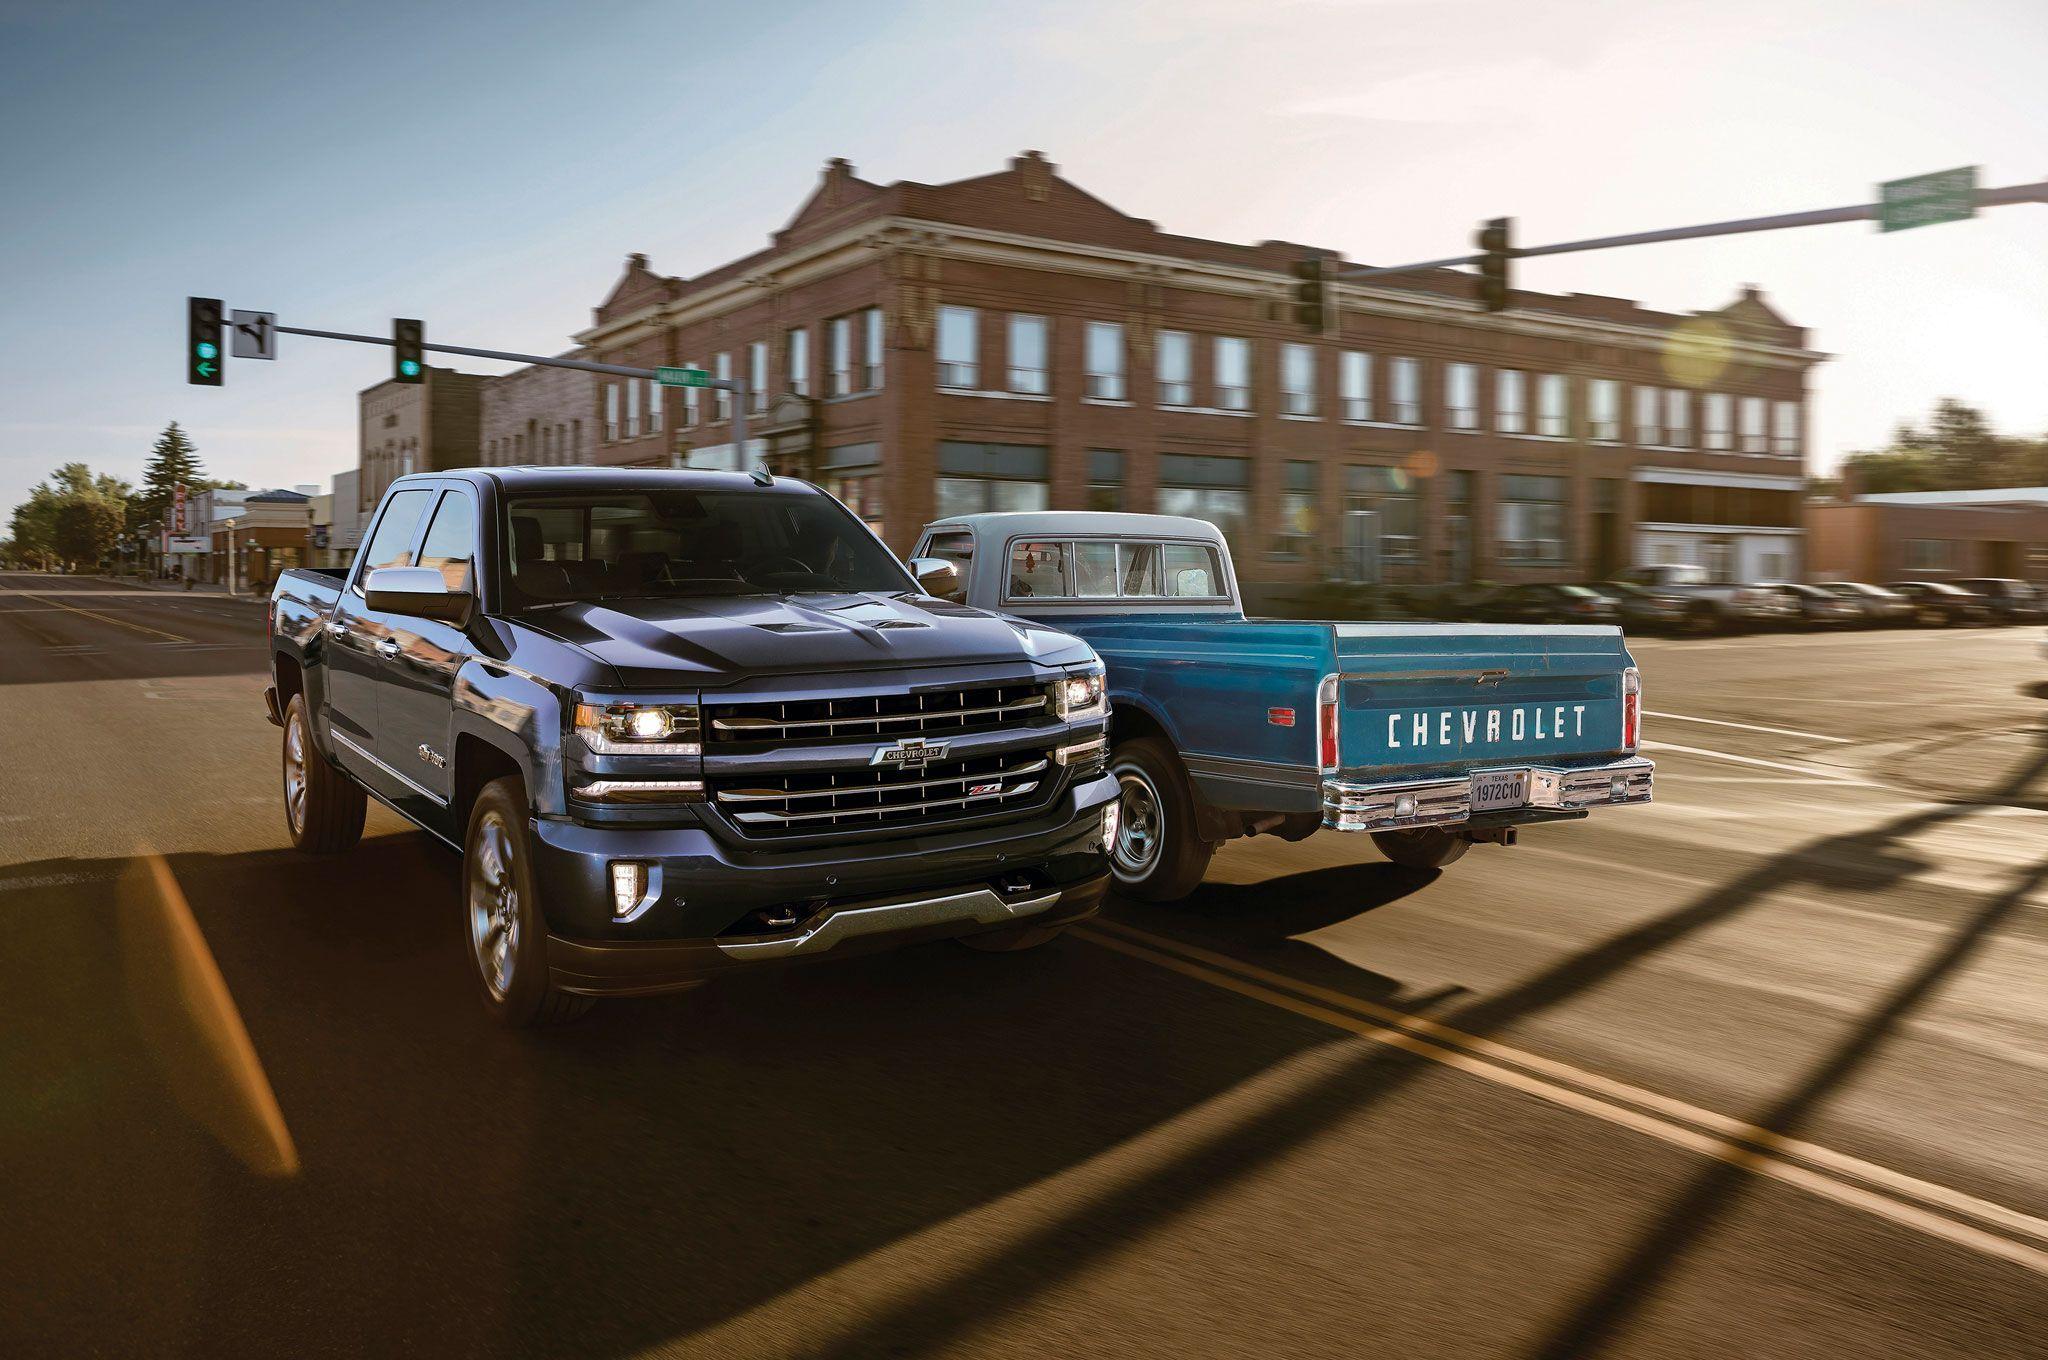 2018 Silverado Centennial Edition Yes Please Chevrolet Silverado Chevy Trucks Chevrolet